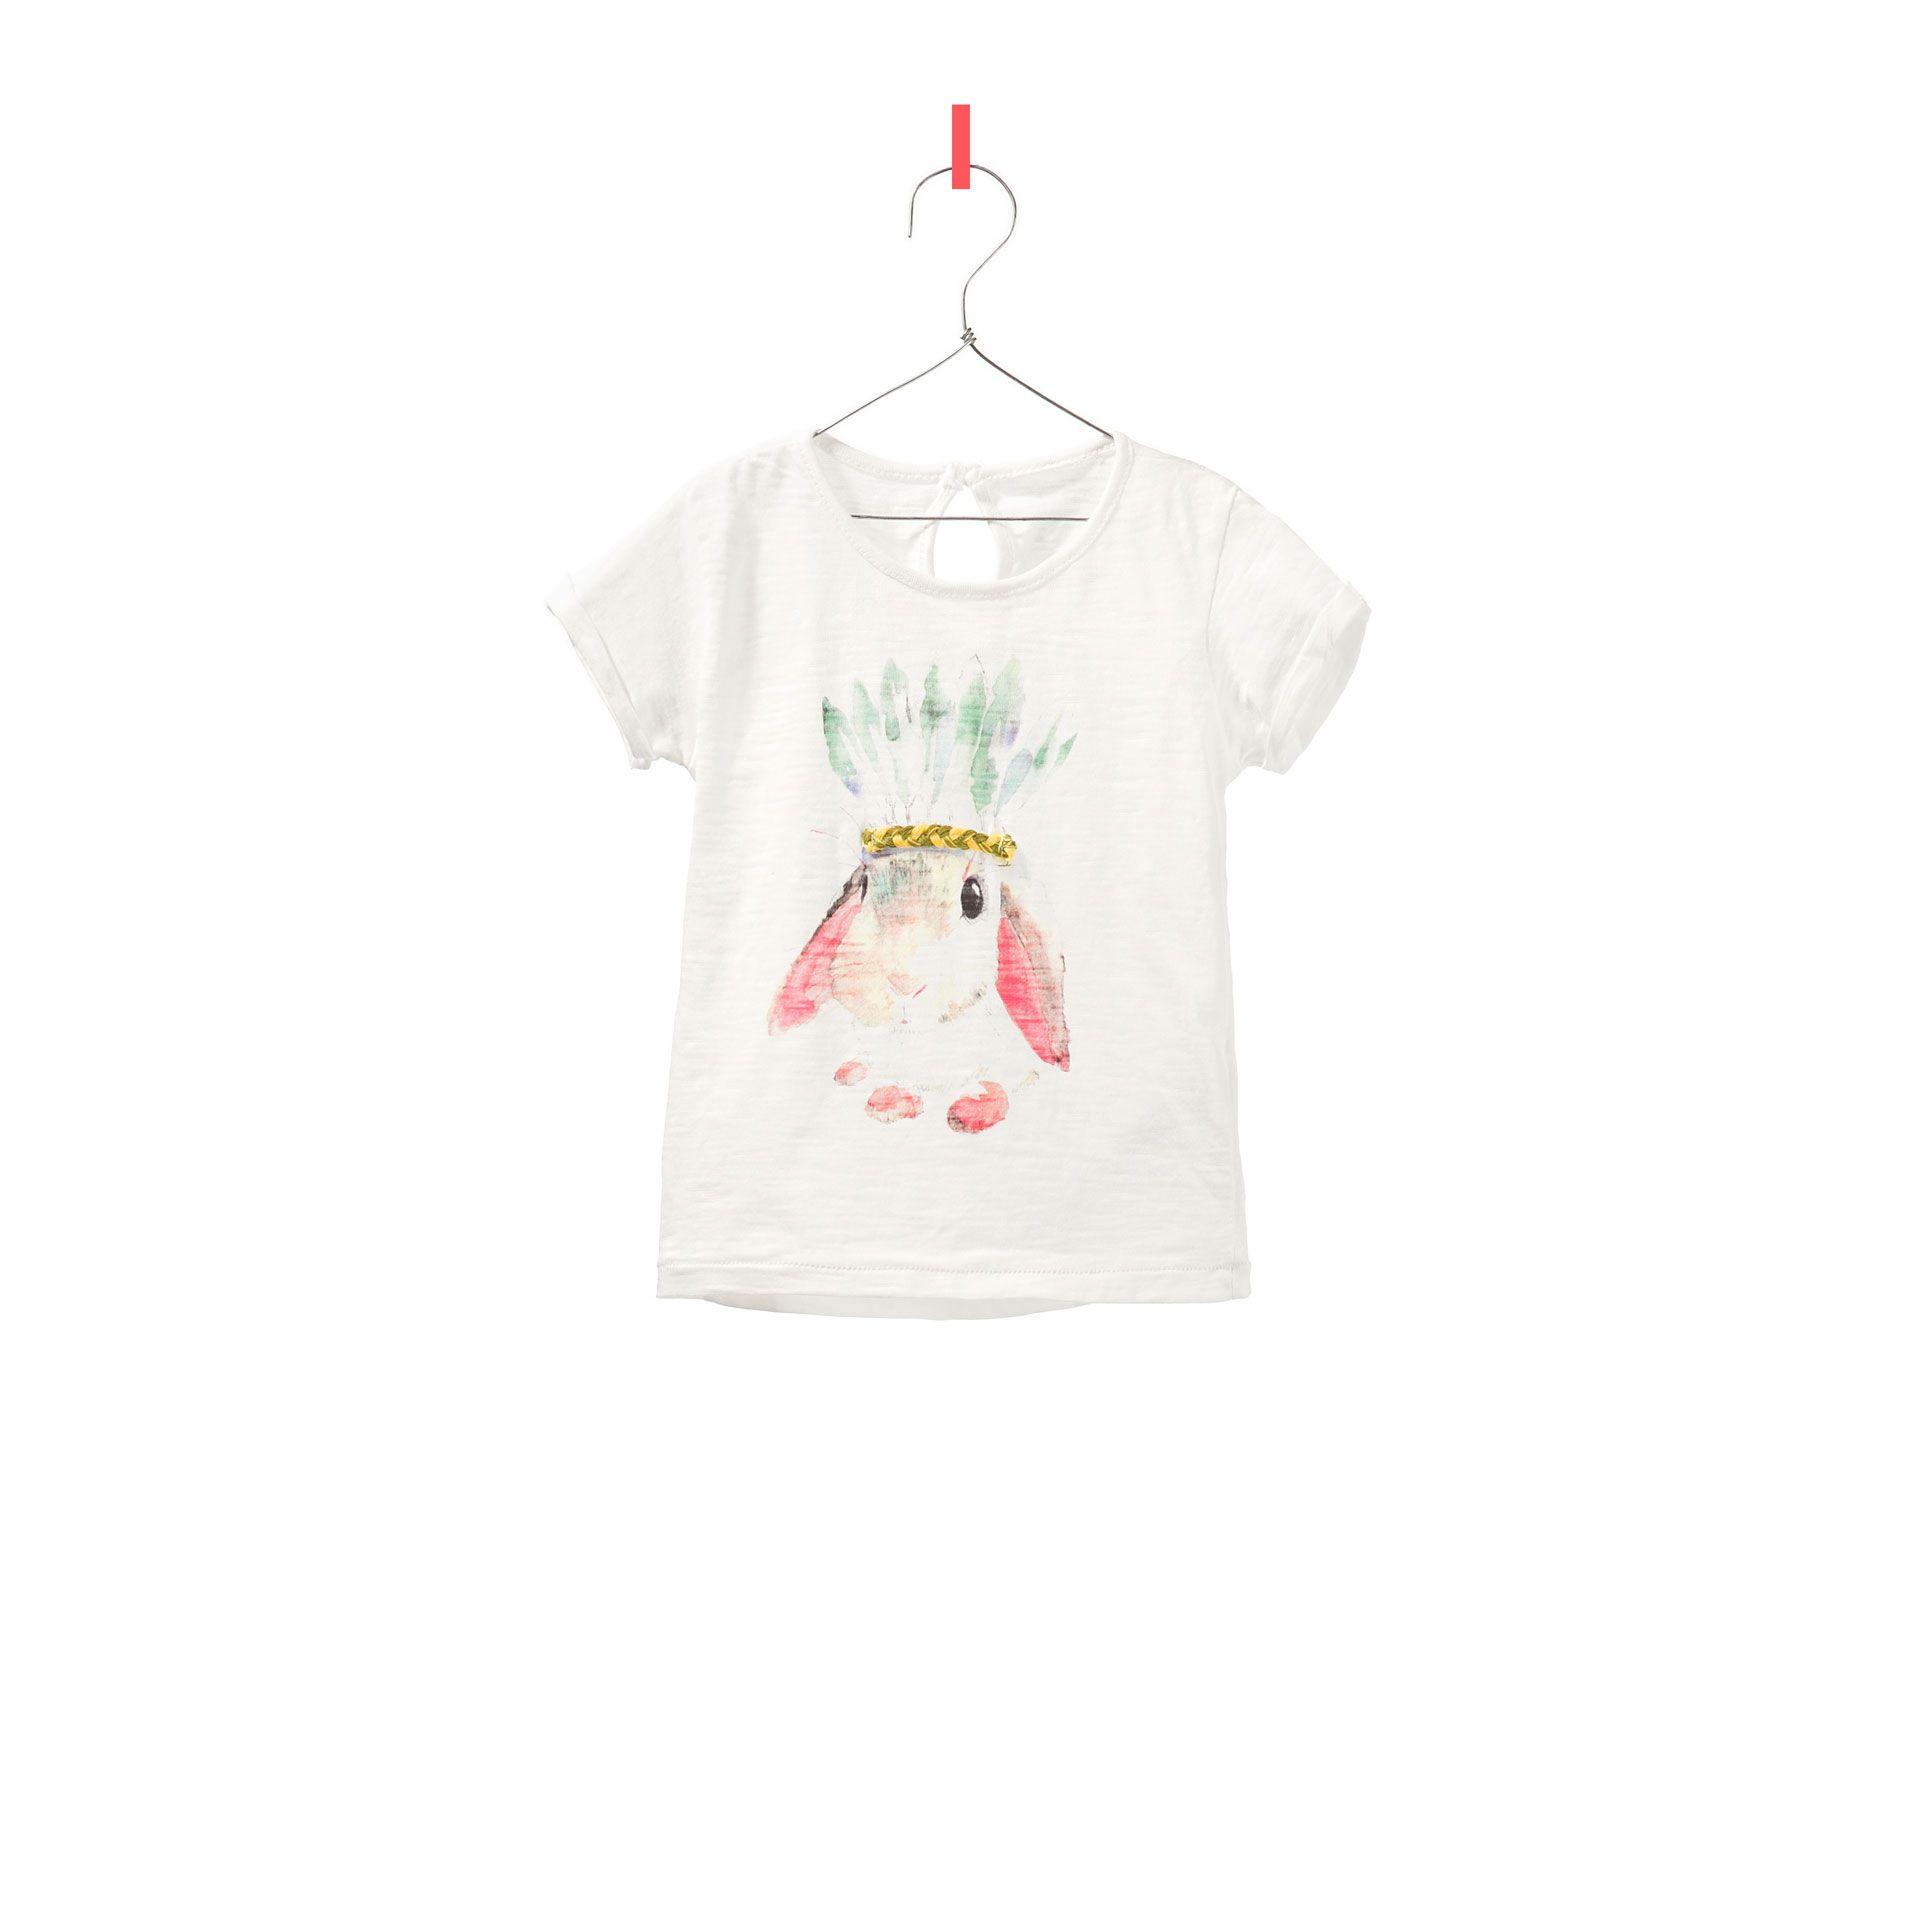 Bunny With Braids T Shirt T Shirts Baby Girl Kids Zara United States